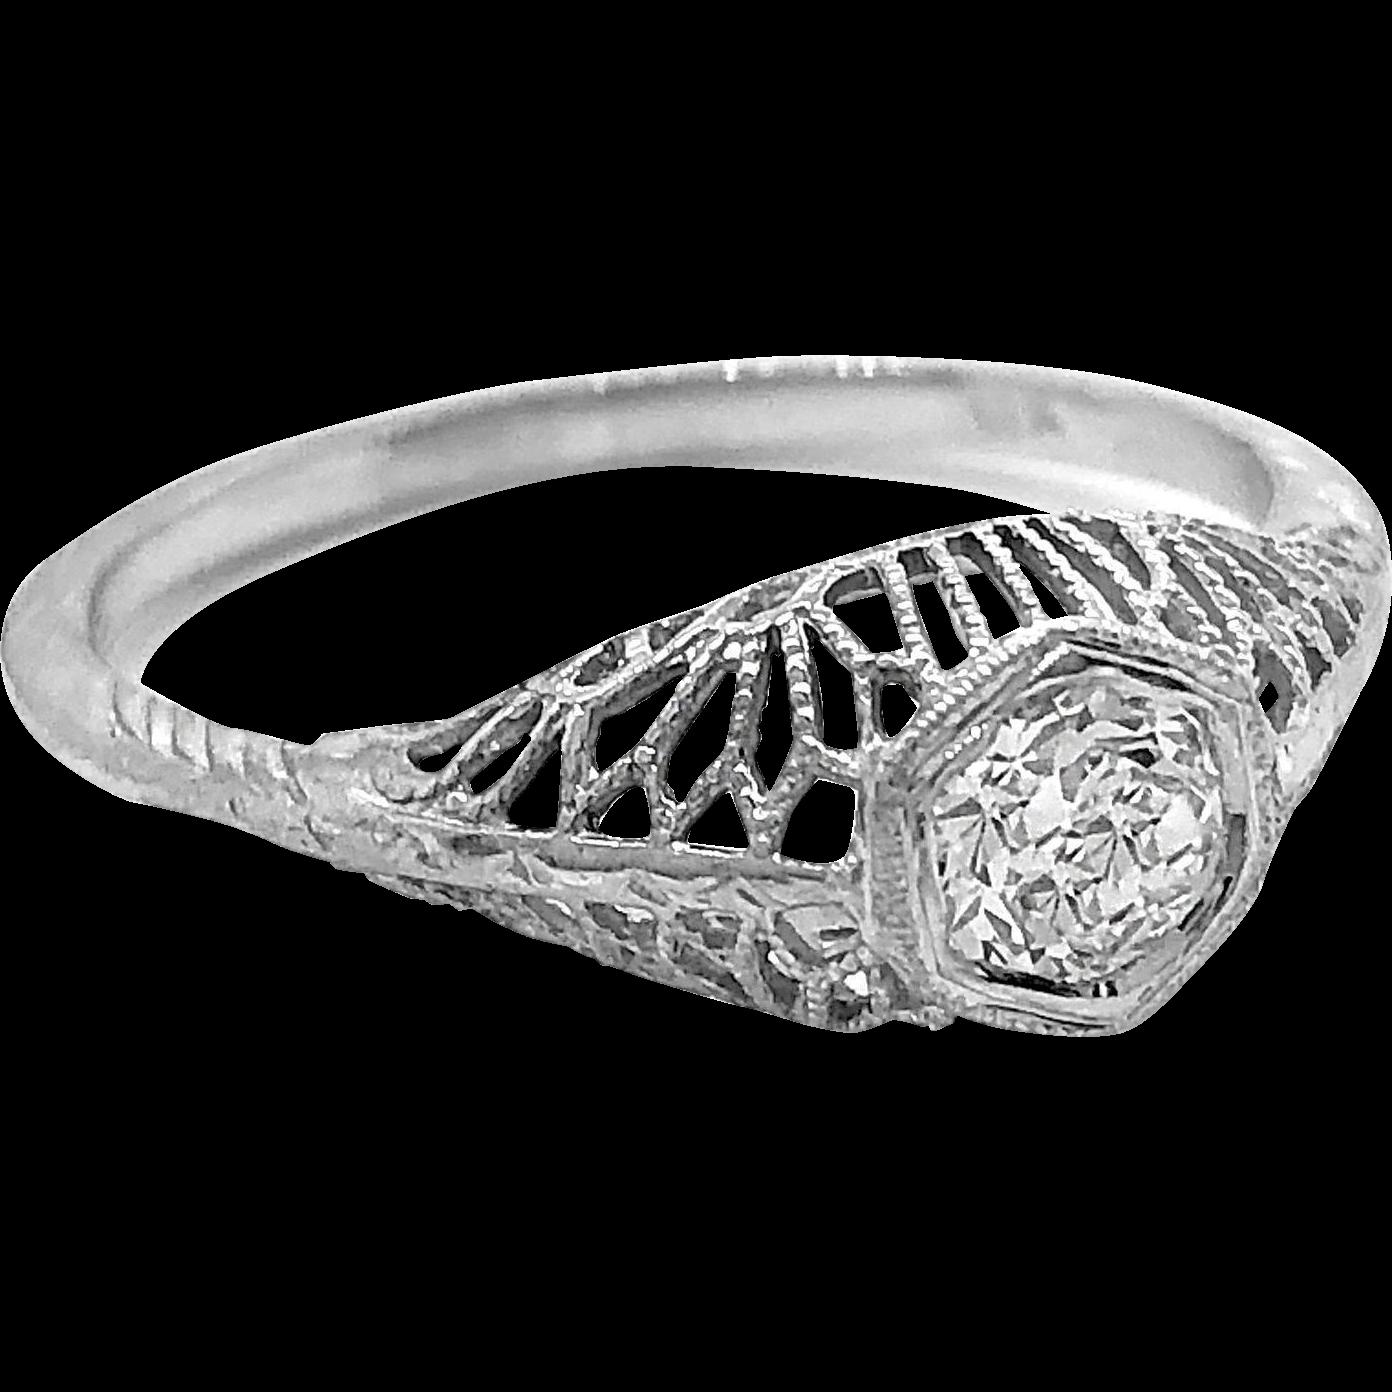 Antique Engagement Ring .25ct. Diamond & 18K White Gold - J36180